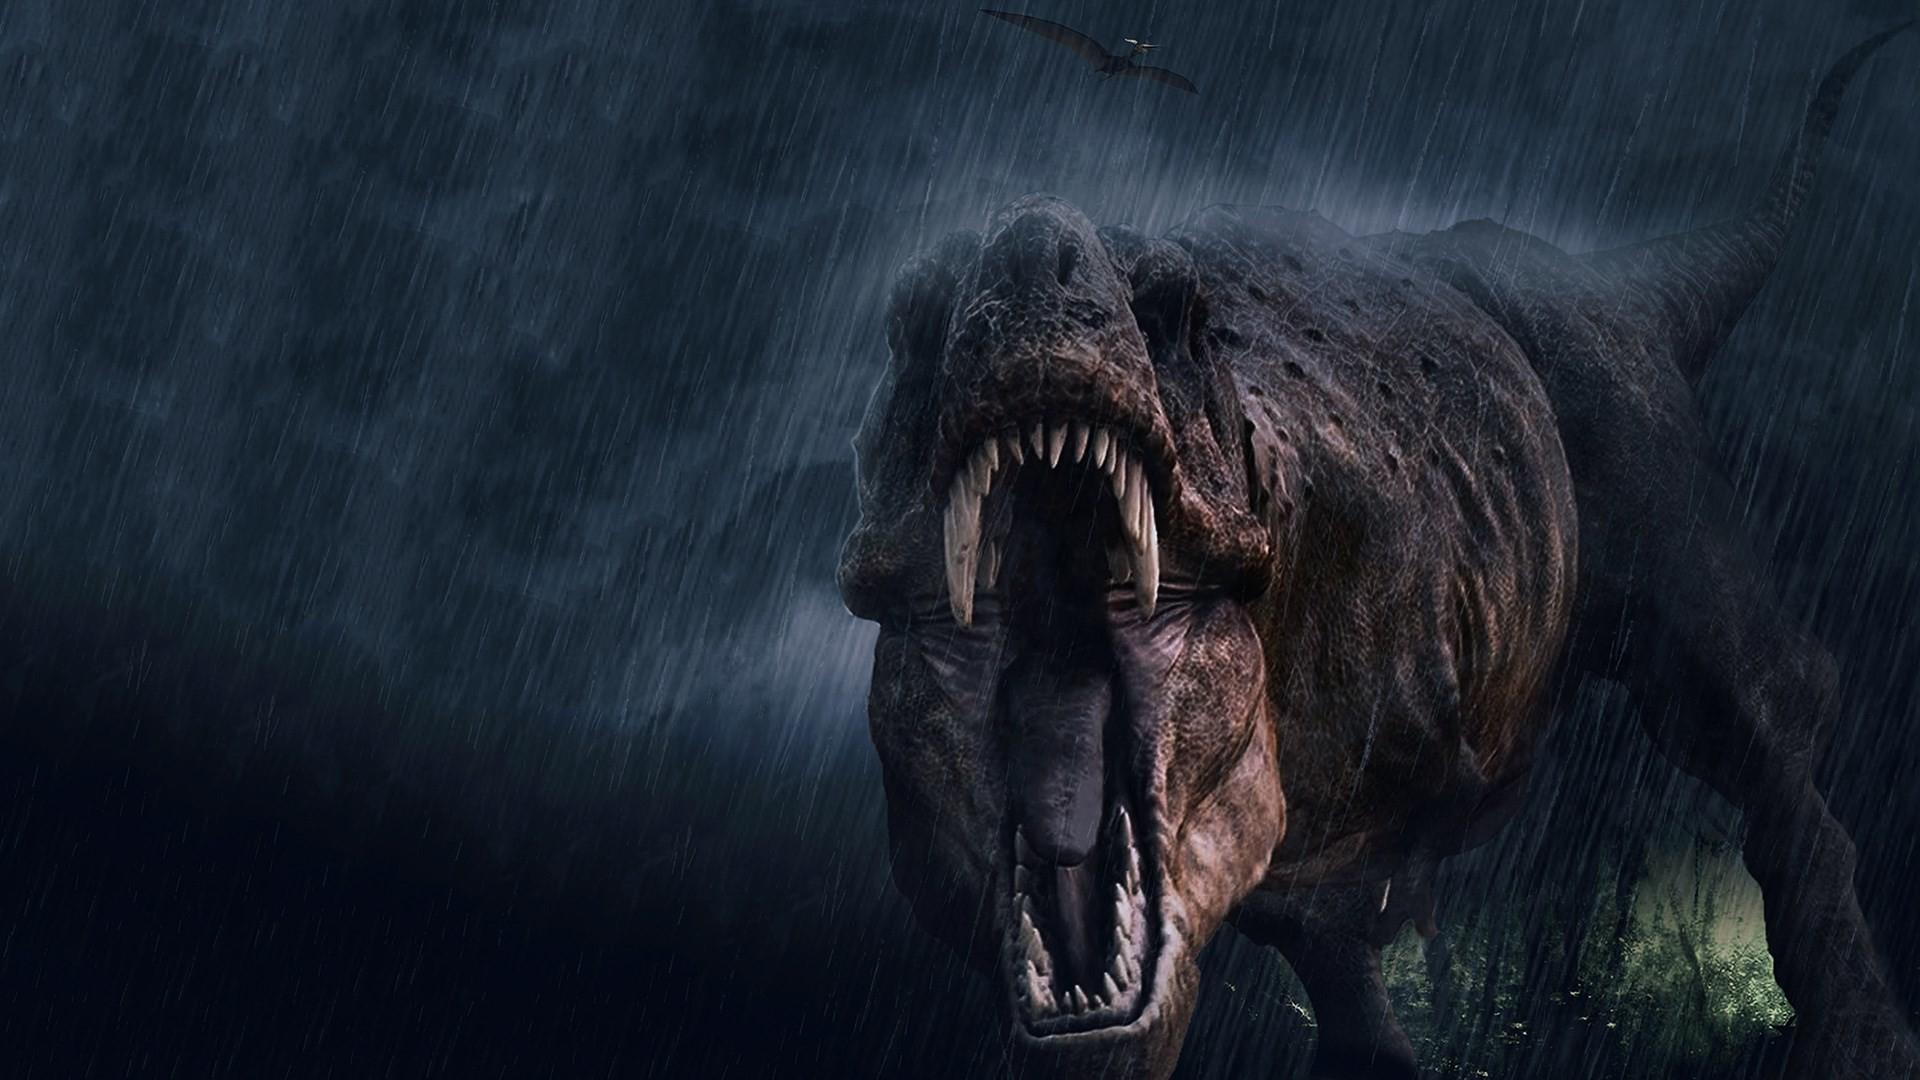 Jurassic Park Background (68+ Images